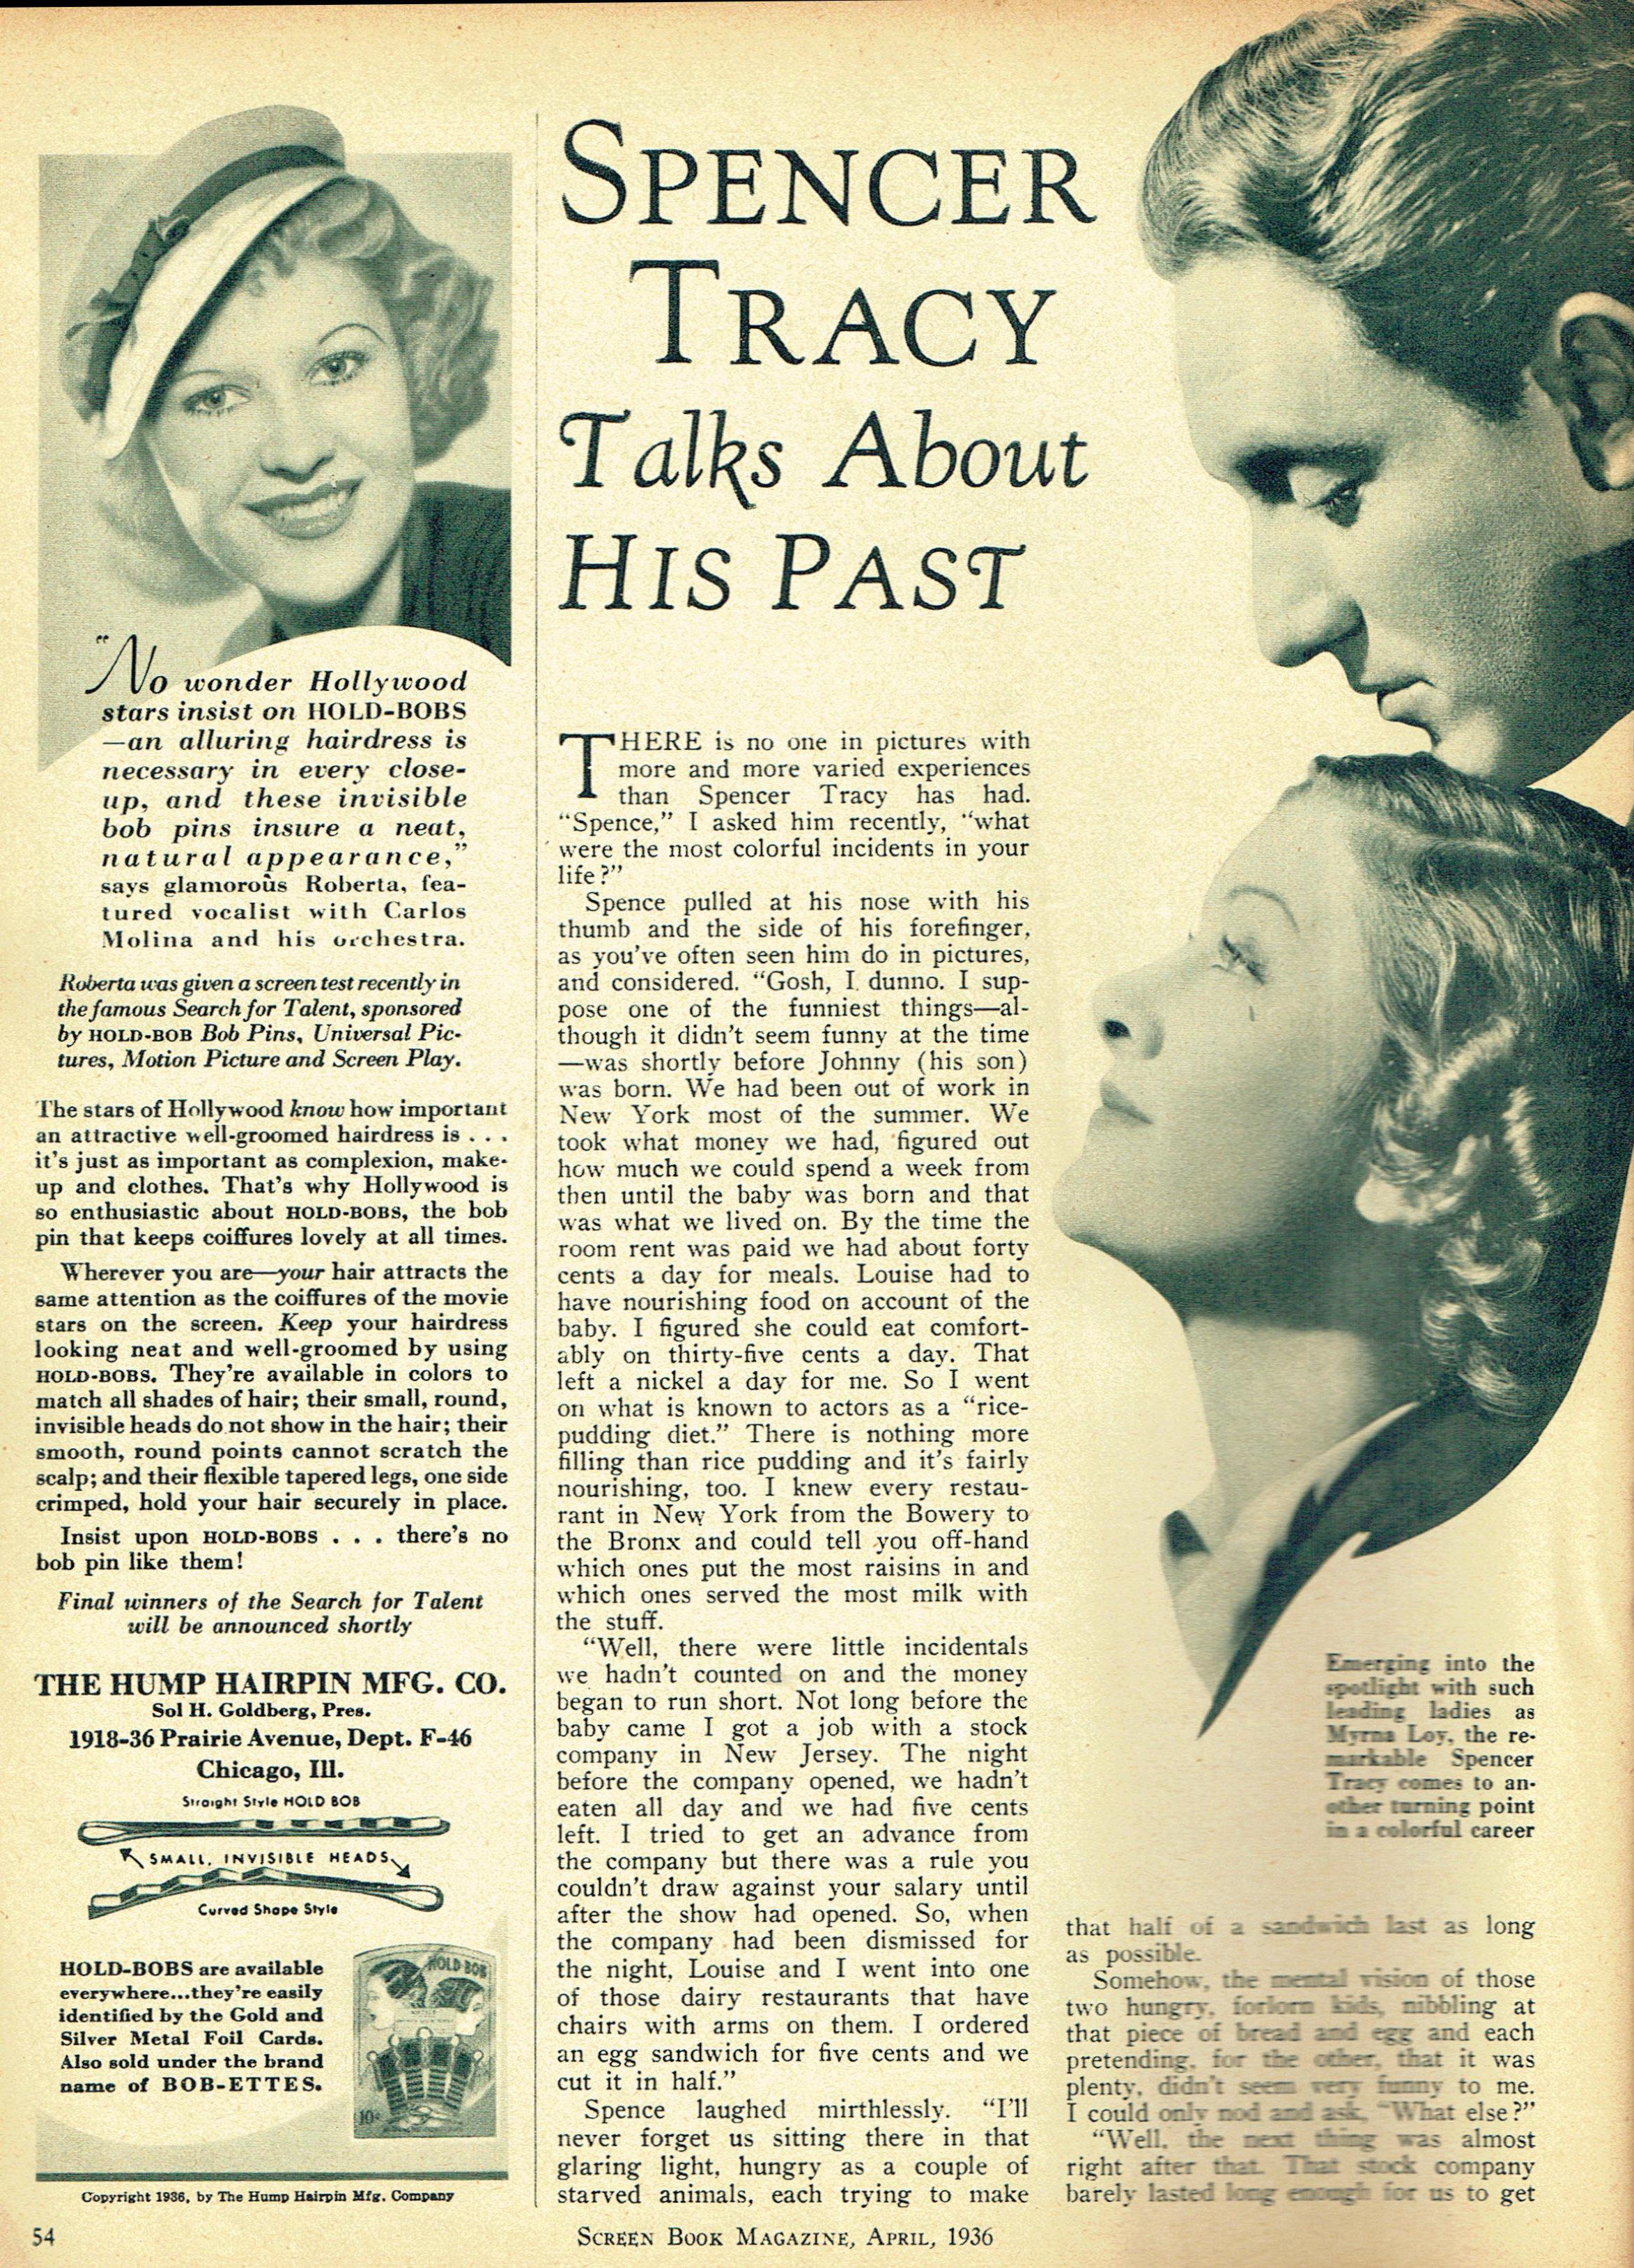 carole lombard screen book april 1936r